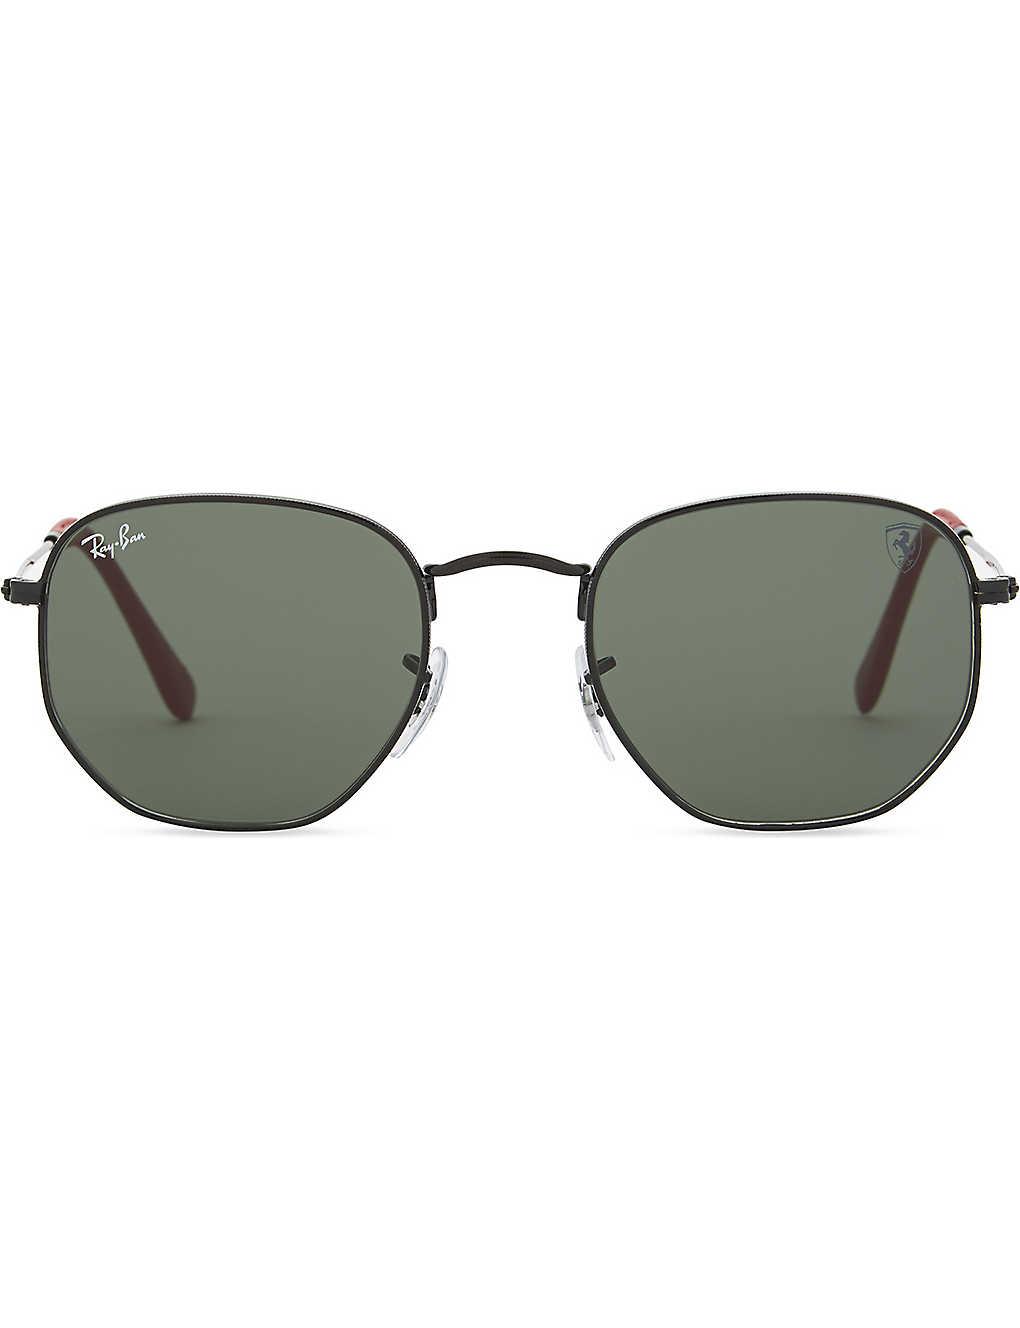 58491a390 RAY-BAN - RB3548NM hexagonal-frame sunglasses | Selfridges.com